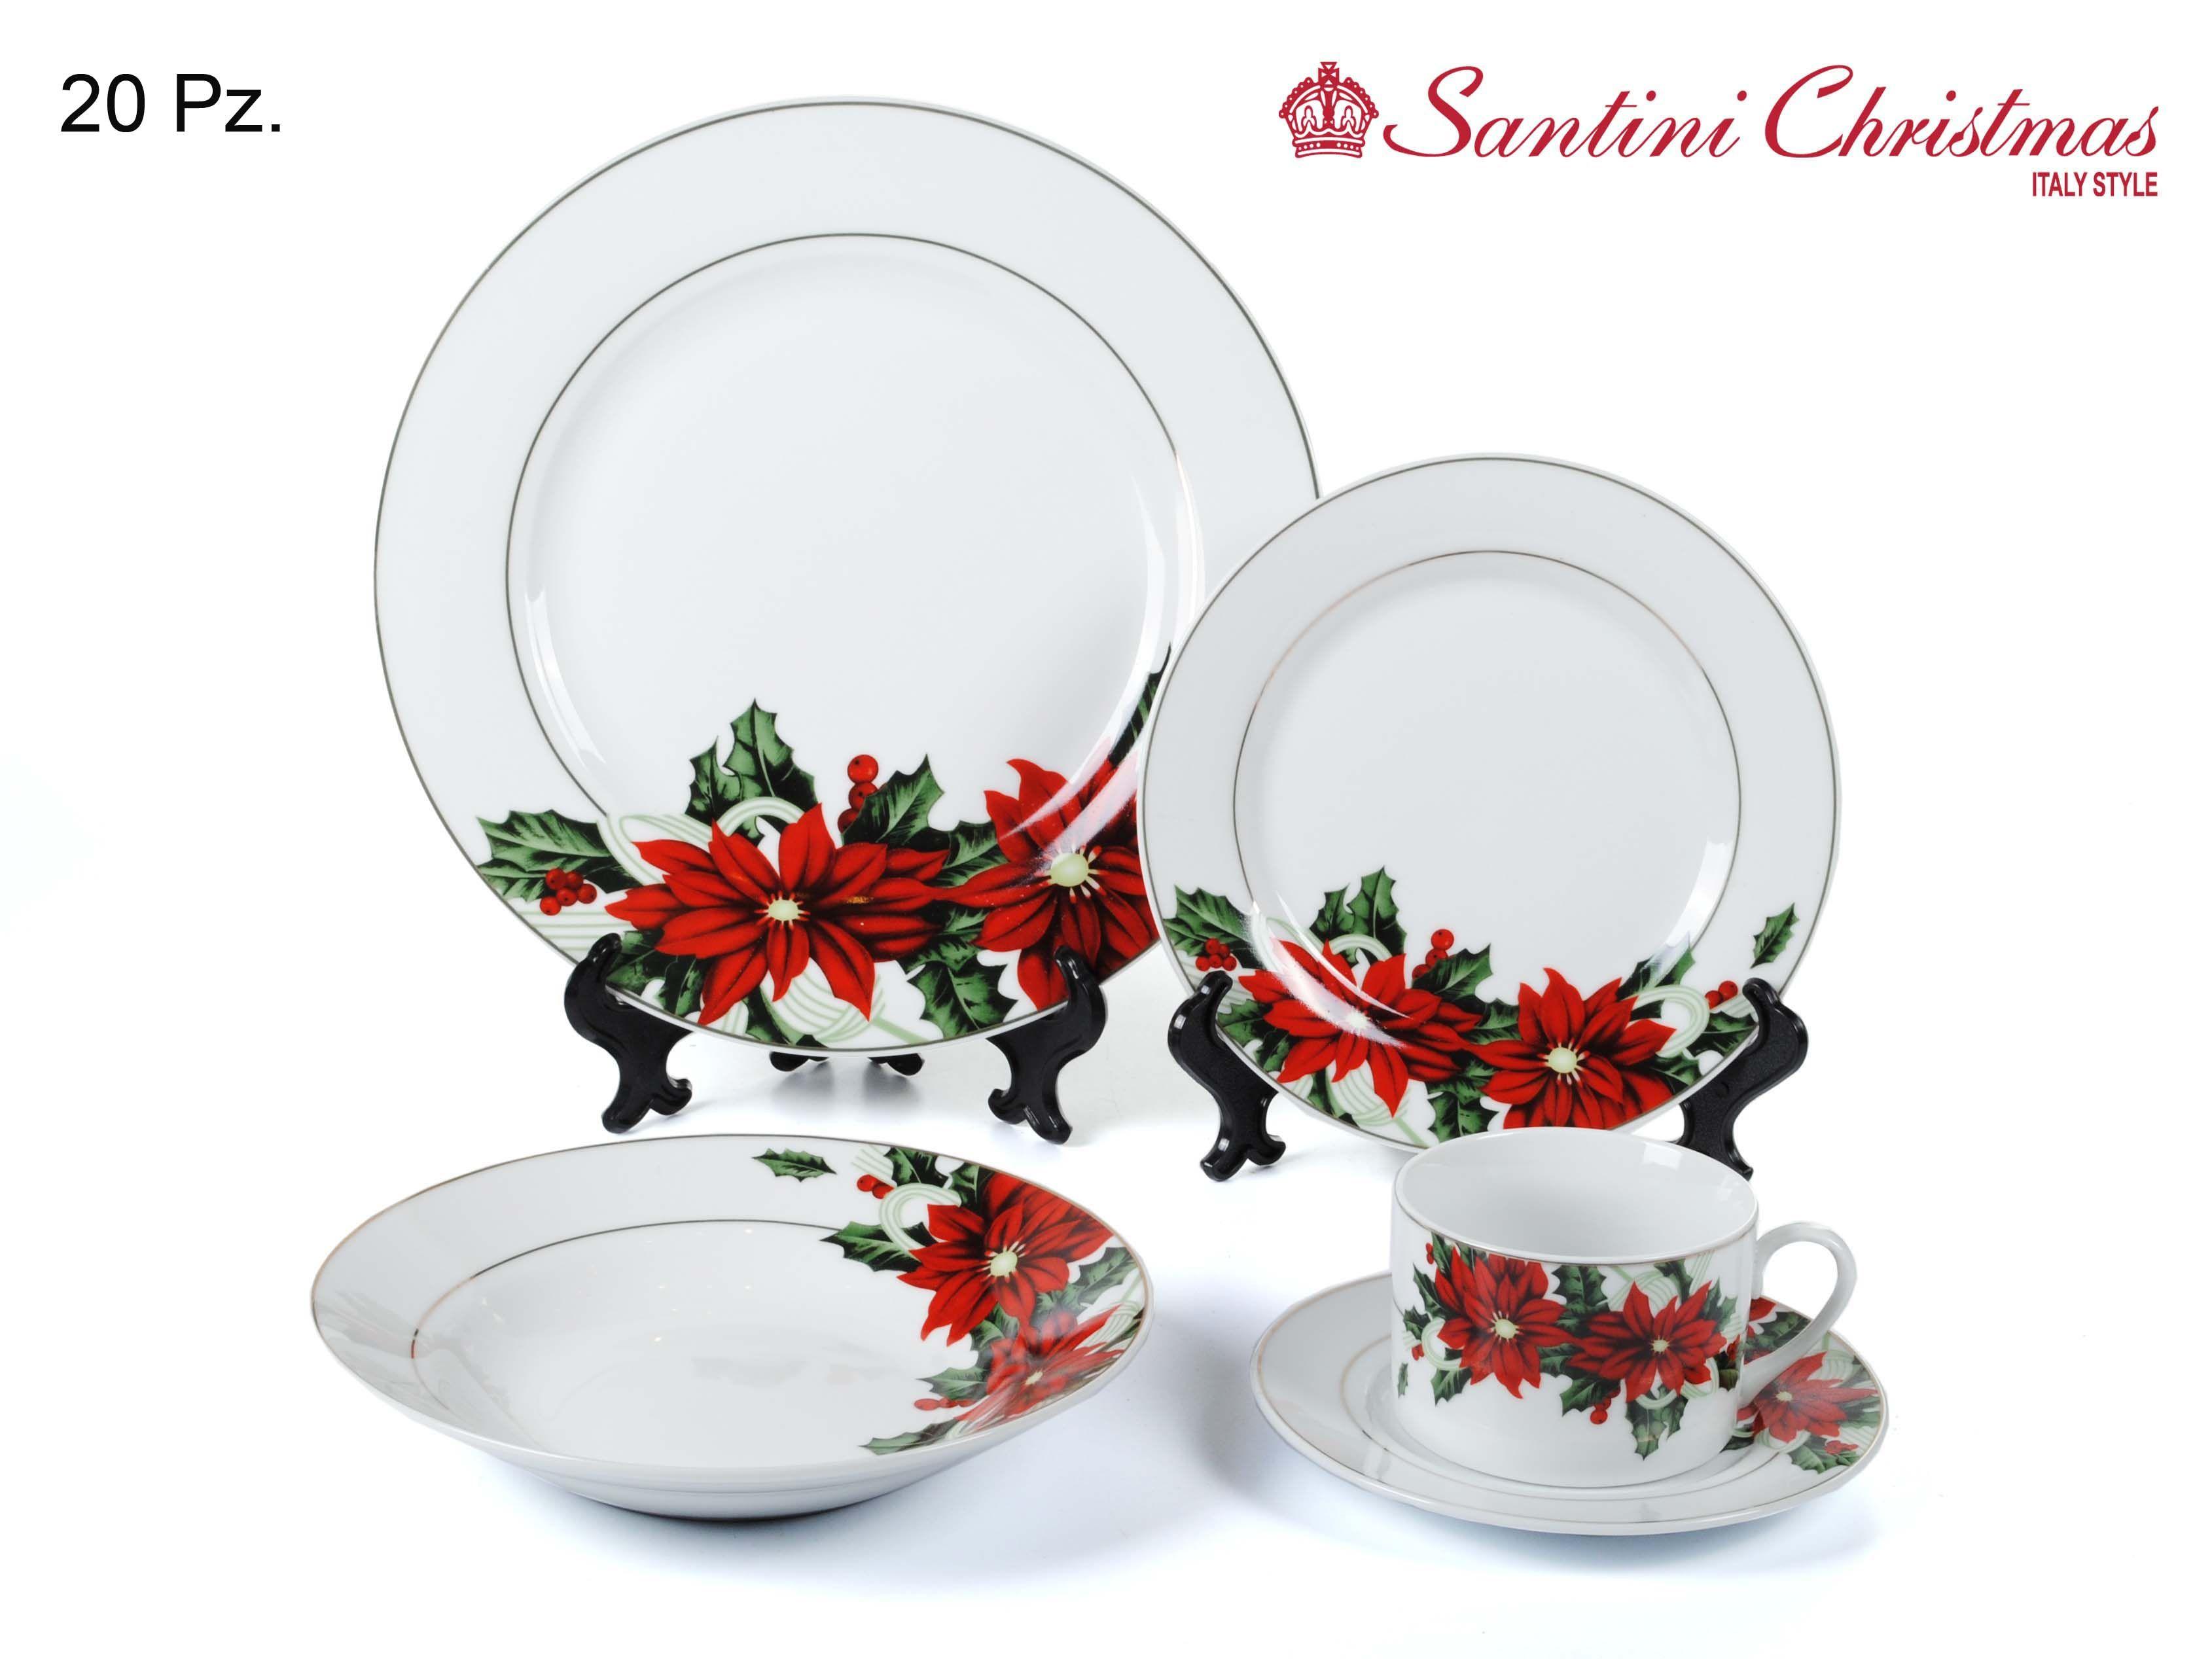 Vajilla de poinsetia poinsettia dinnerware set for Vajillas para navidad